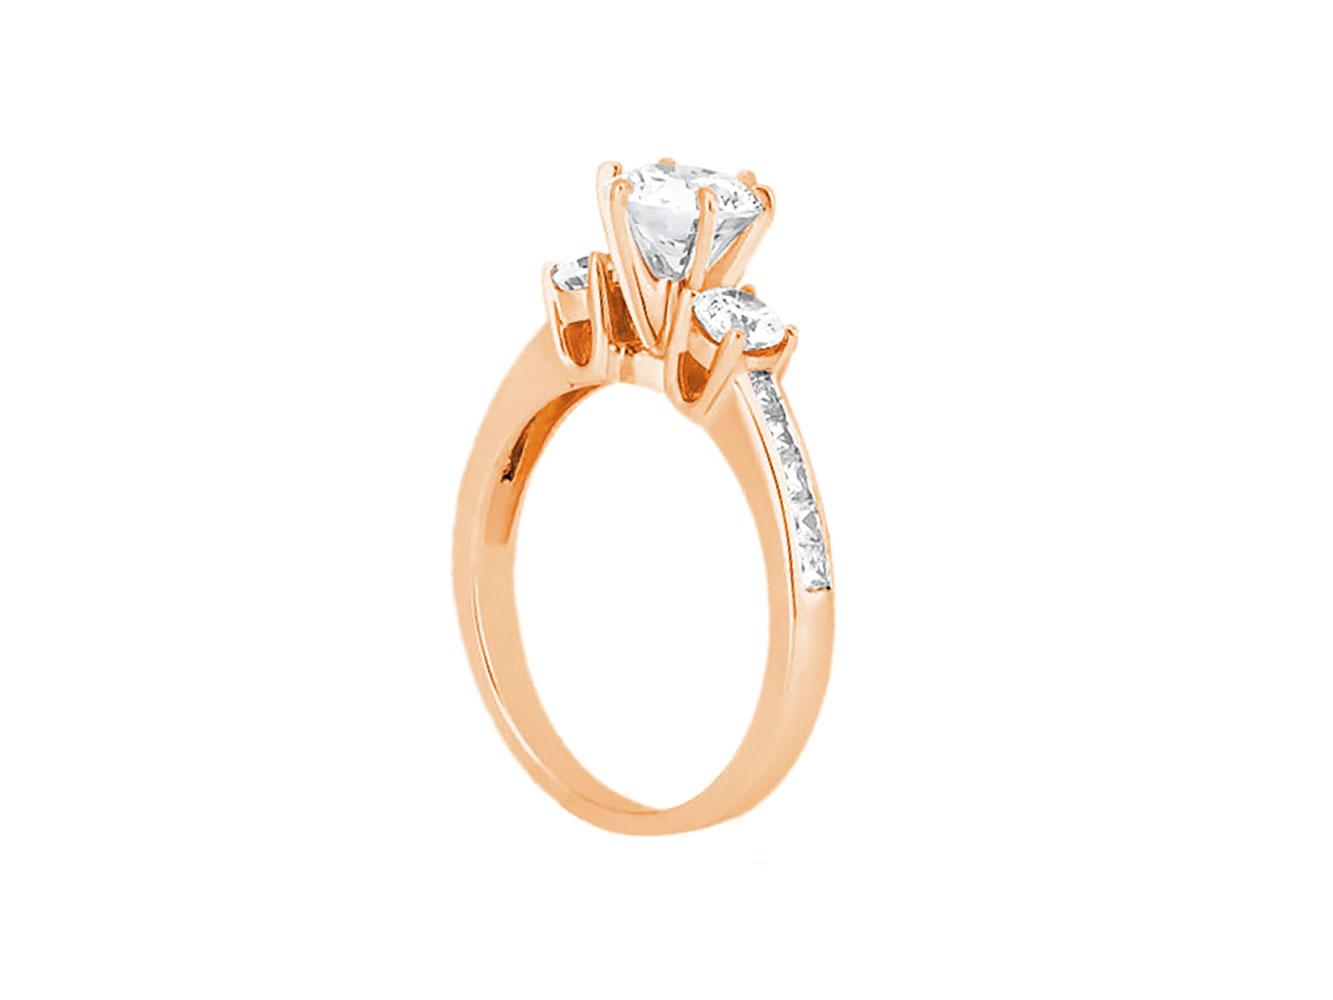 1-10-Quilates-Redondo-Princesa-Anillo-de-Compromiso-Diamante-Corte-10-Oro-Kl-I1 miniatura 5